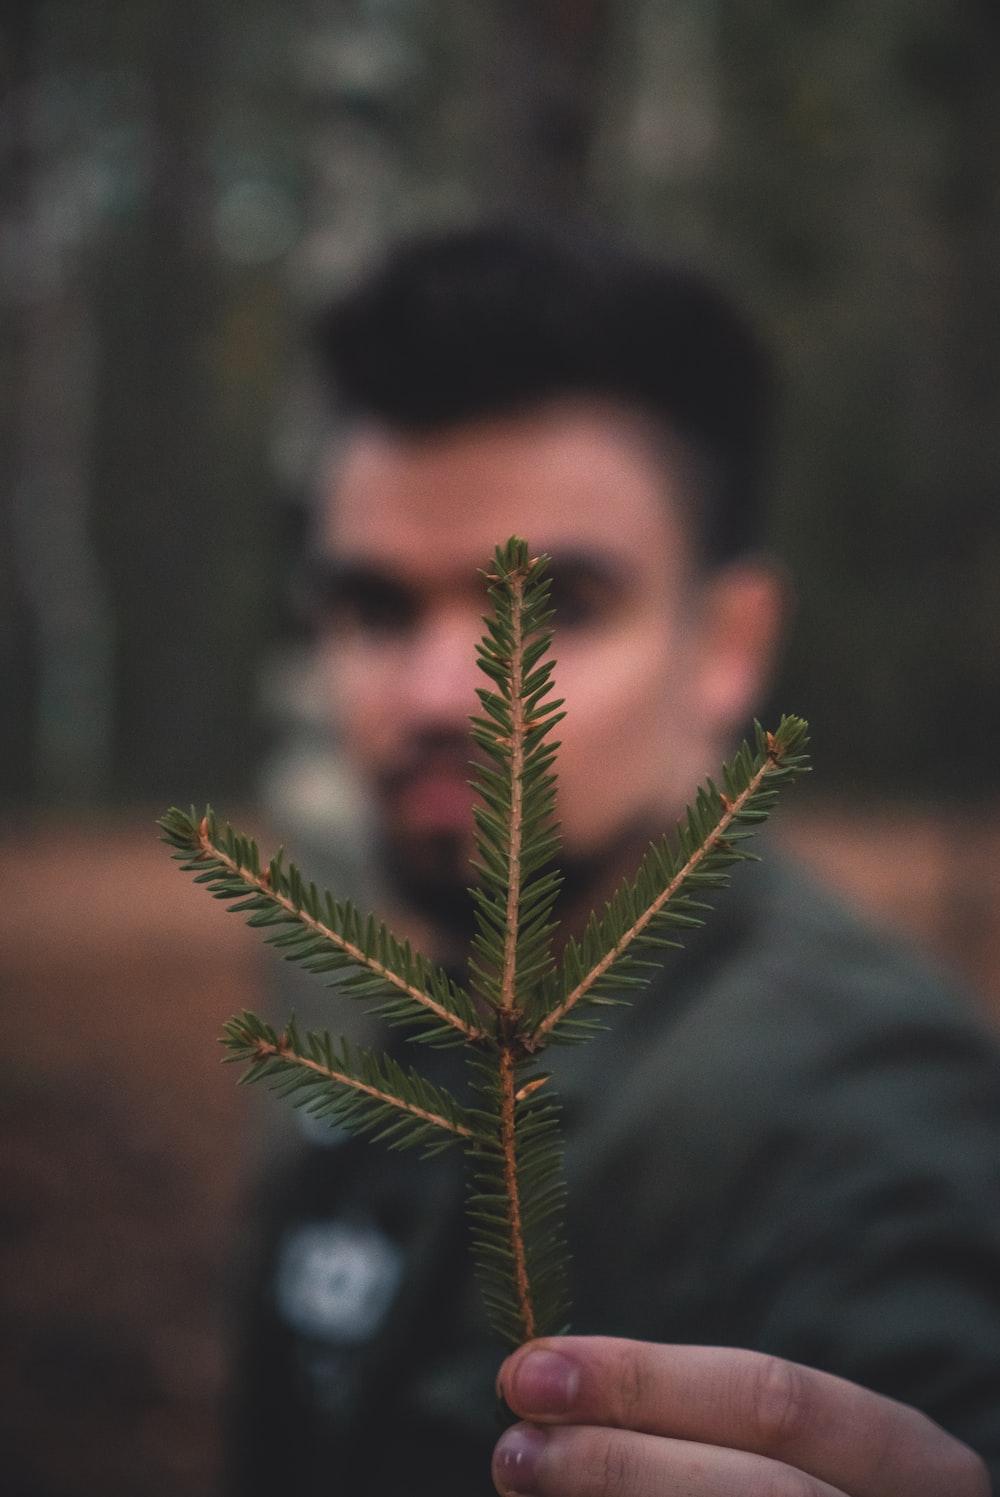 man in gray hoodie holding green leaf